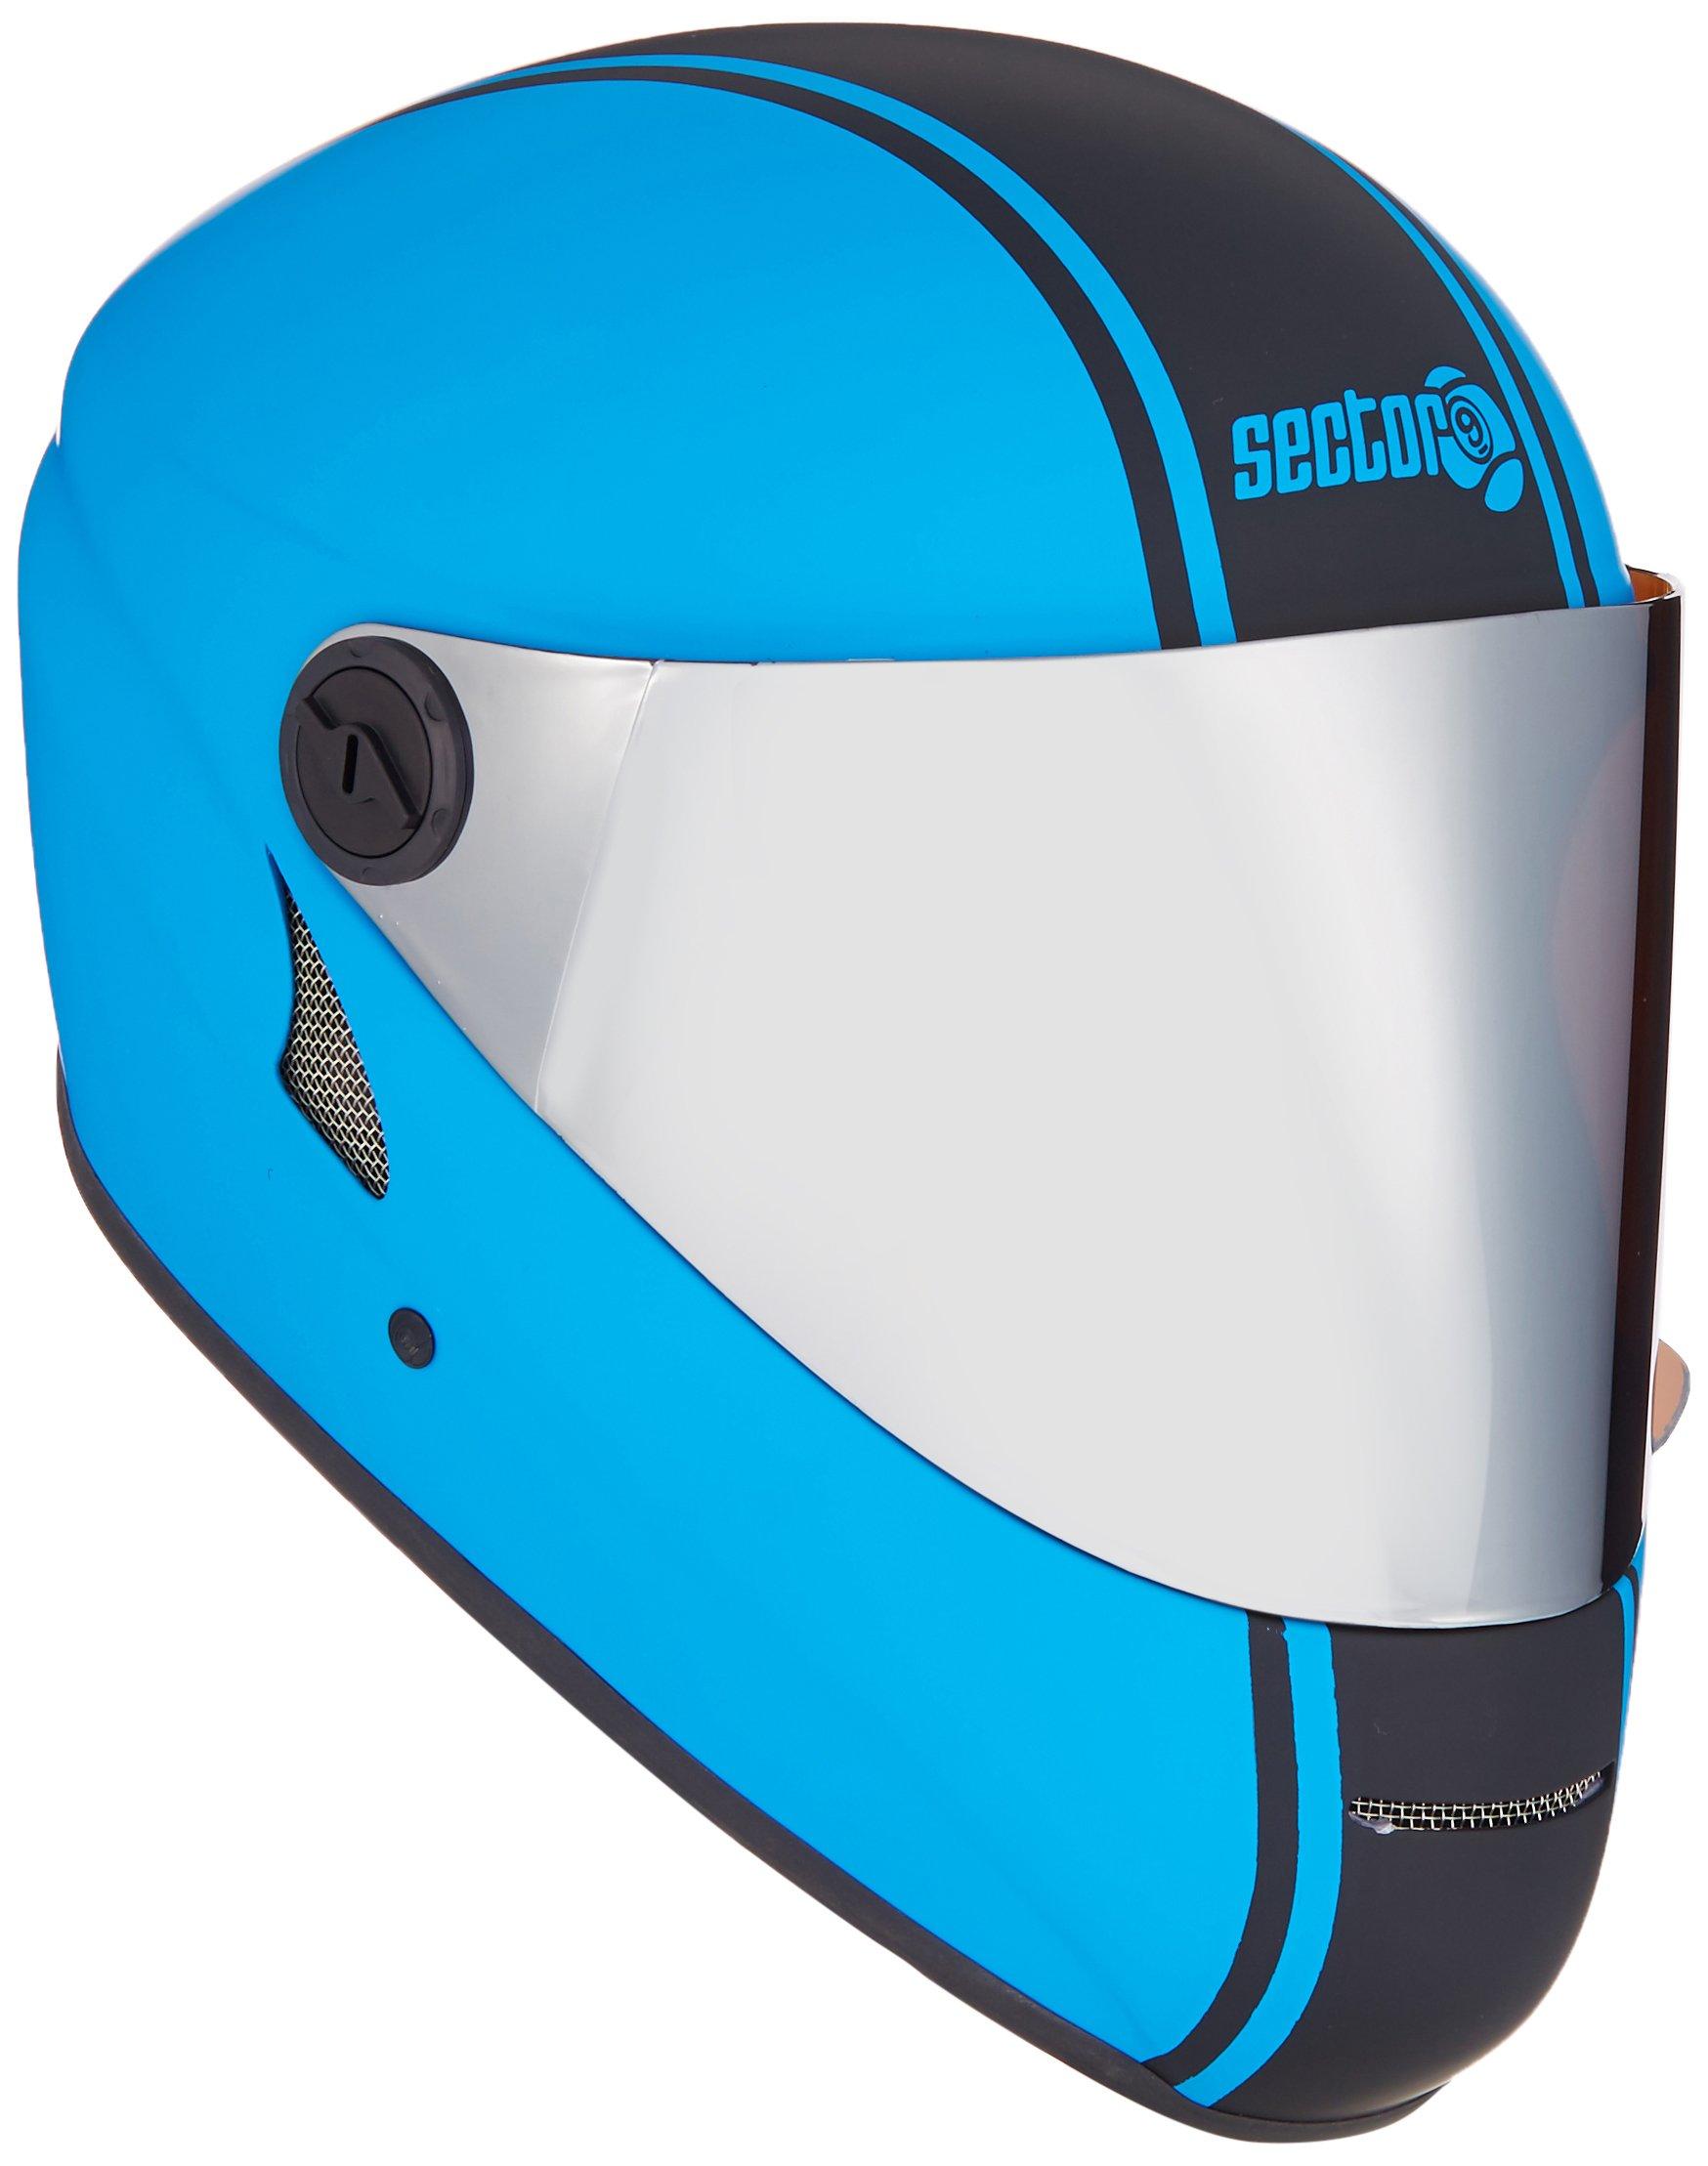 Sector 9 Channel Downhill Full Face Helmet, Blue